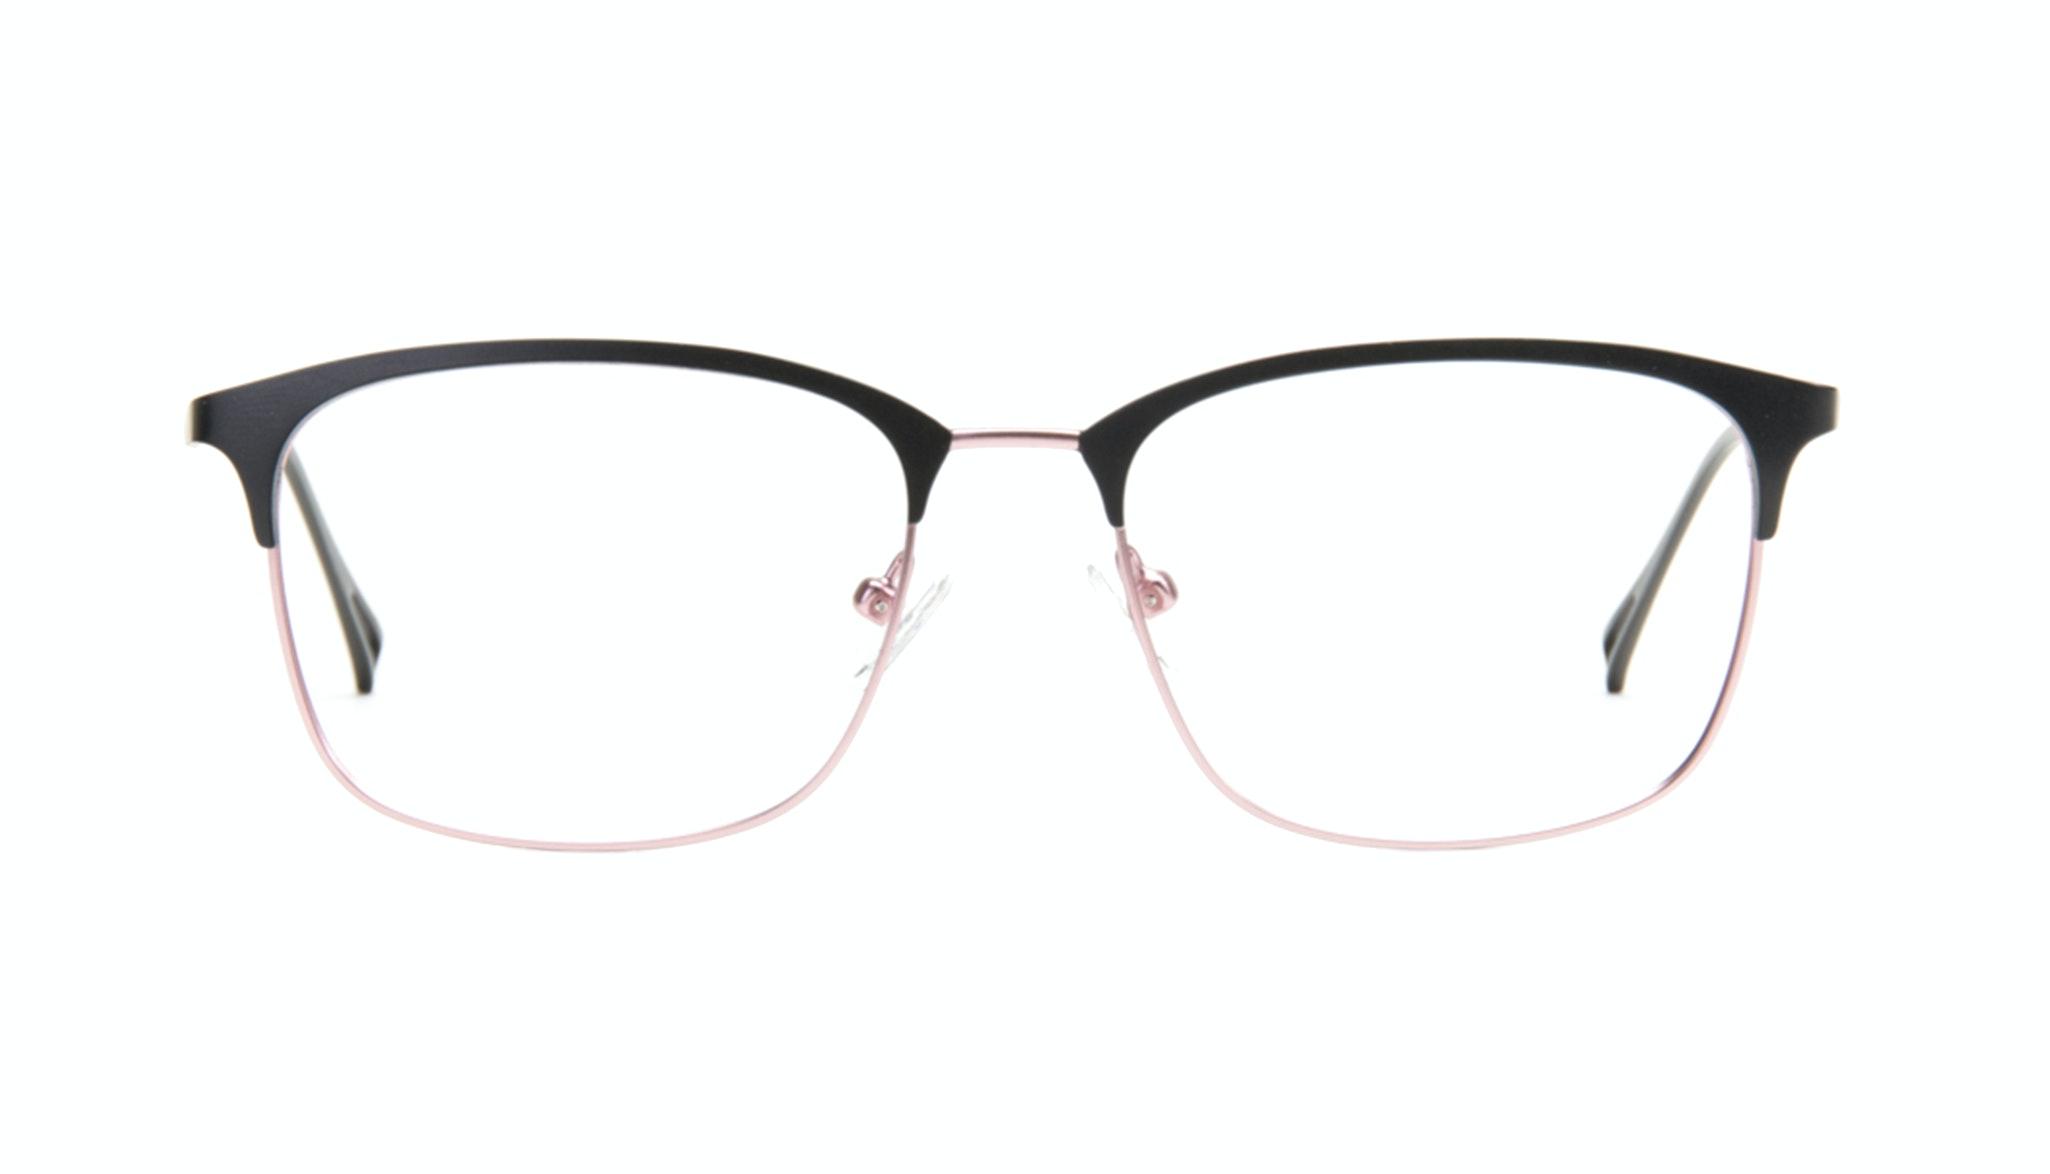 Affordable Fashion Glasses Rectangle Eyeglasses Women Seaside Deep Silver Front